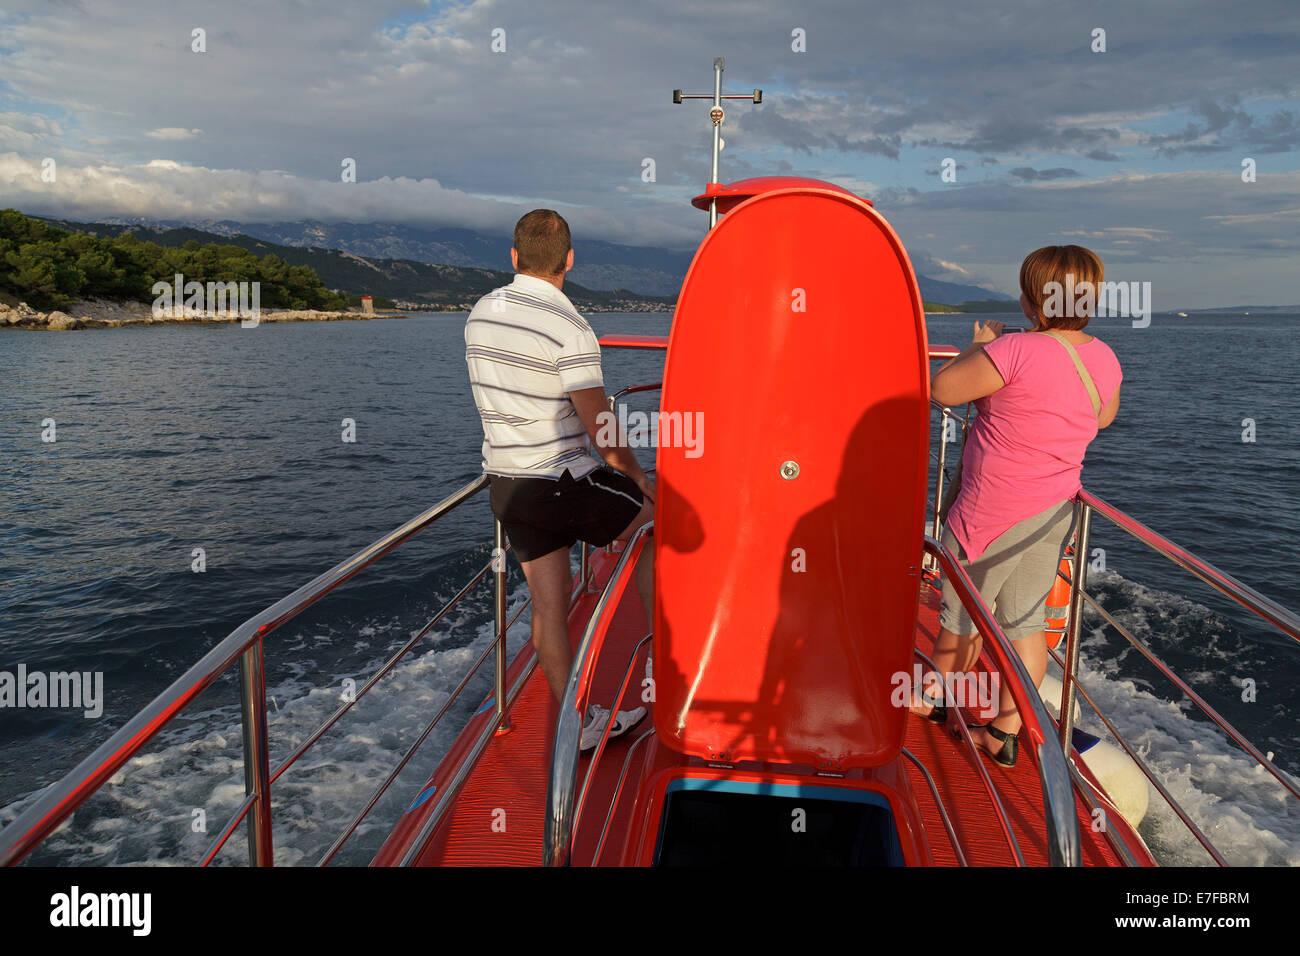 Ausflug mit dem halb-u-Boot, Stadt Rab, Insel Rab, Kvarner